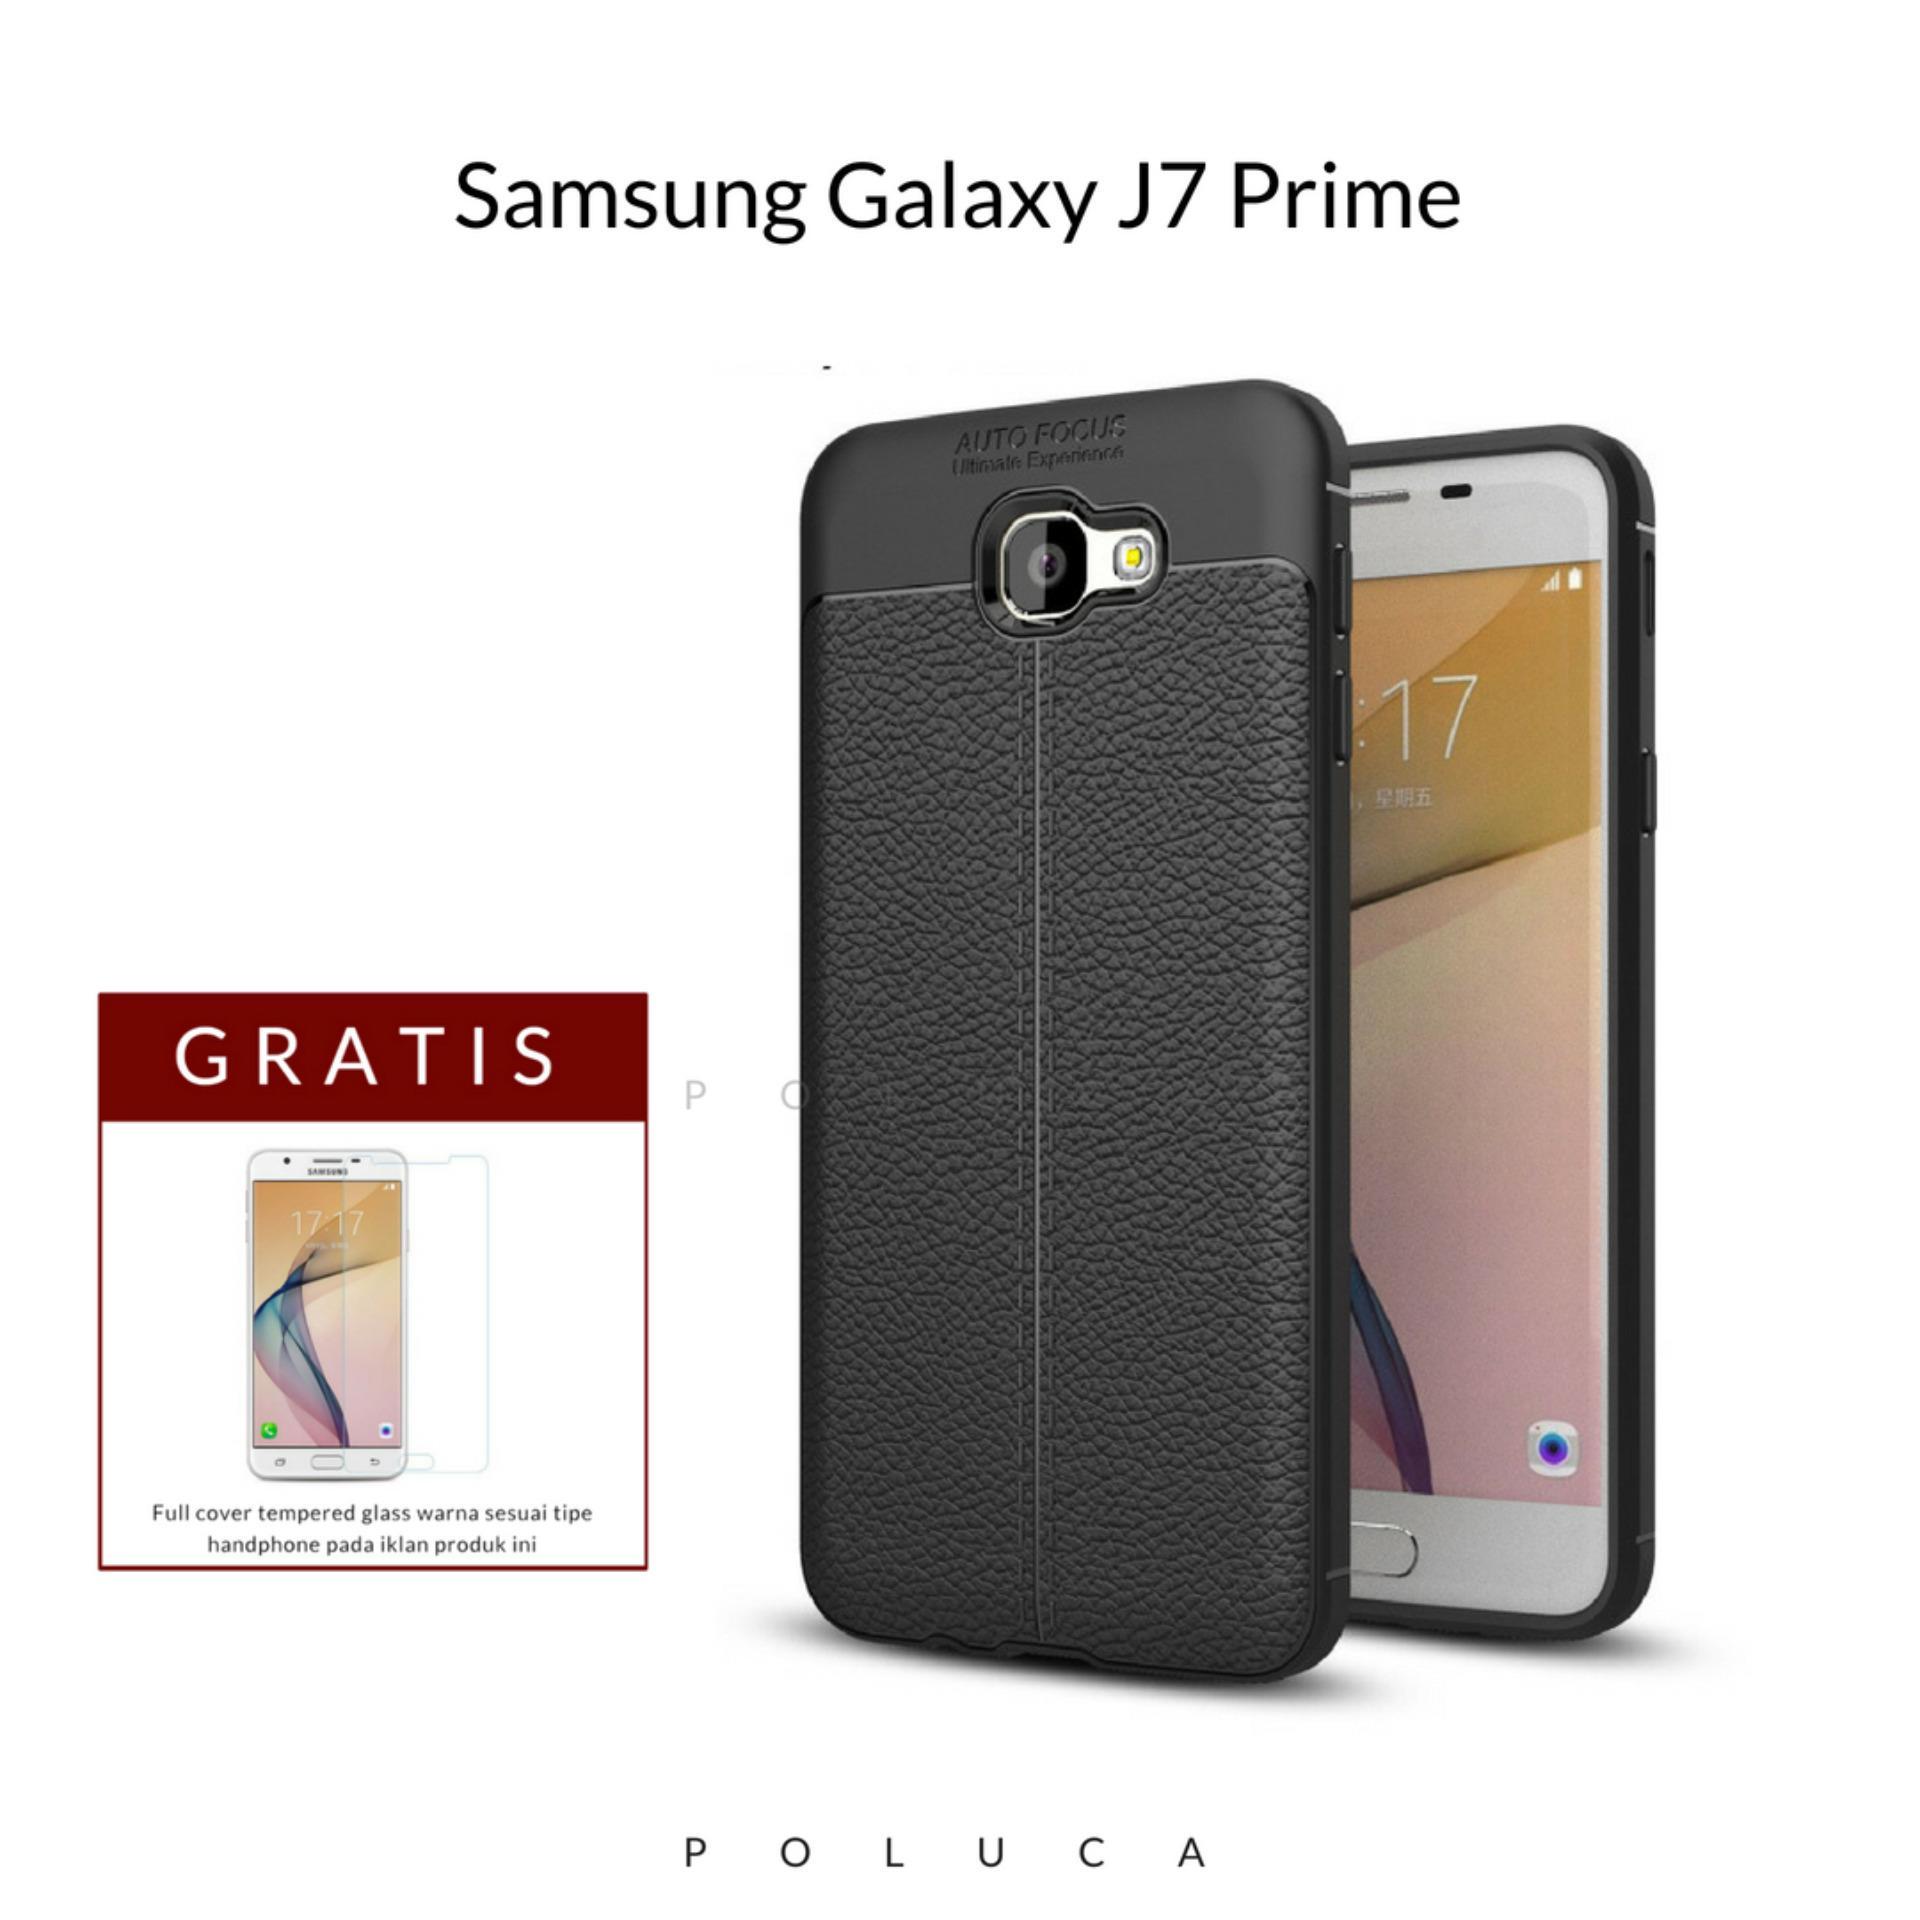 Poluca Luxury Case For Samsung Galaxy J7 Prime Ultimate Experience TPU Leather Autofocus - Black +